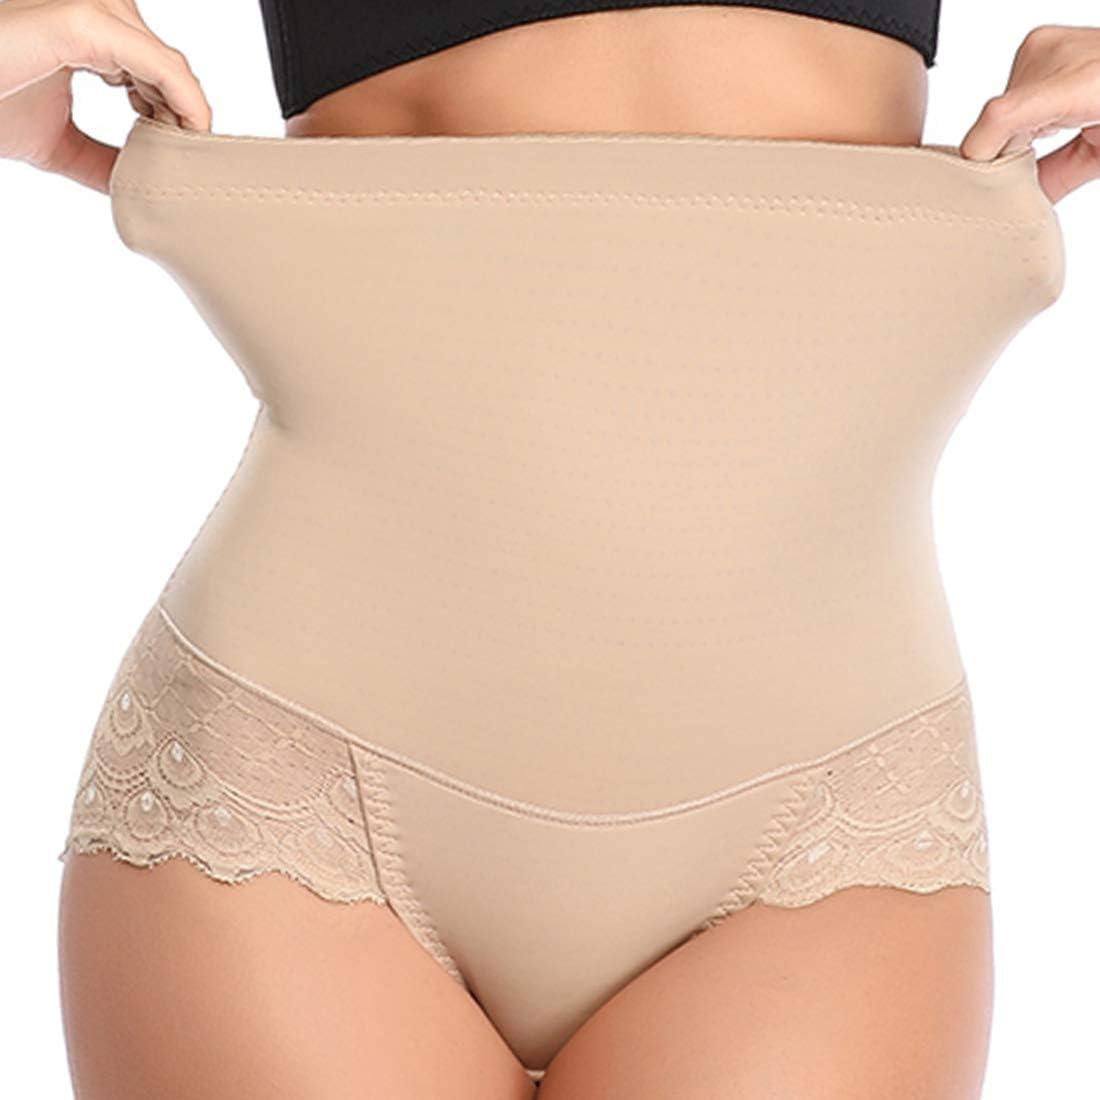 Womens High Waist Briefs Shapewear Cotton Pants Tummy Shaper Seamless Underwear